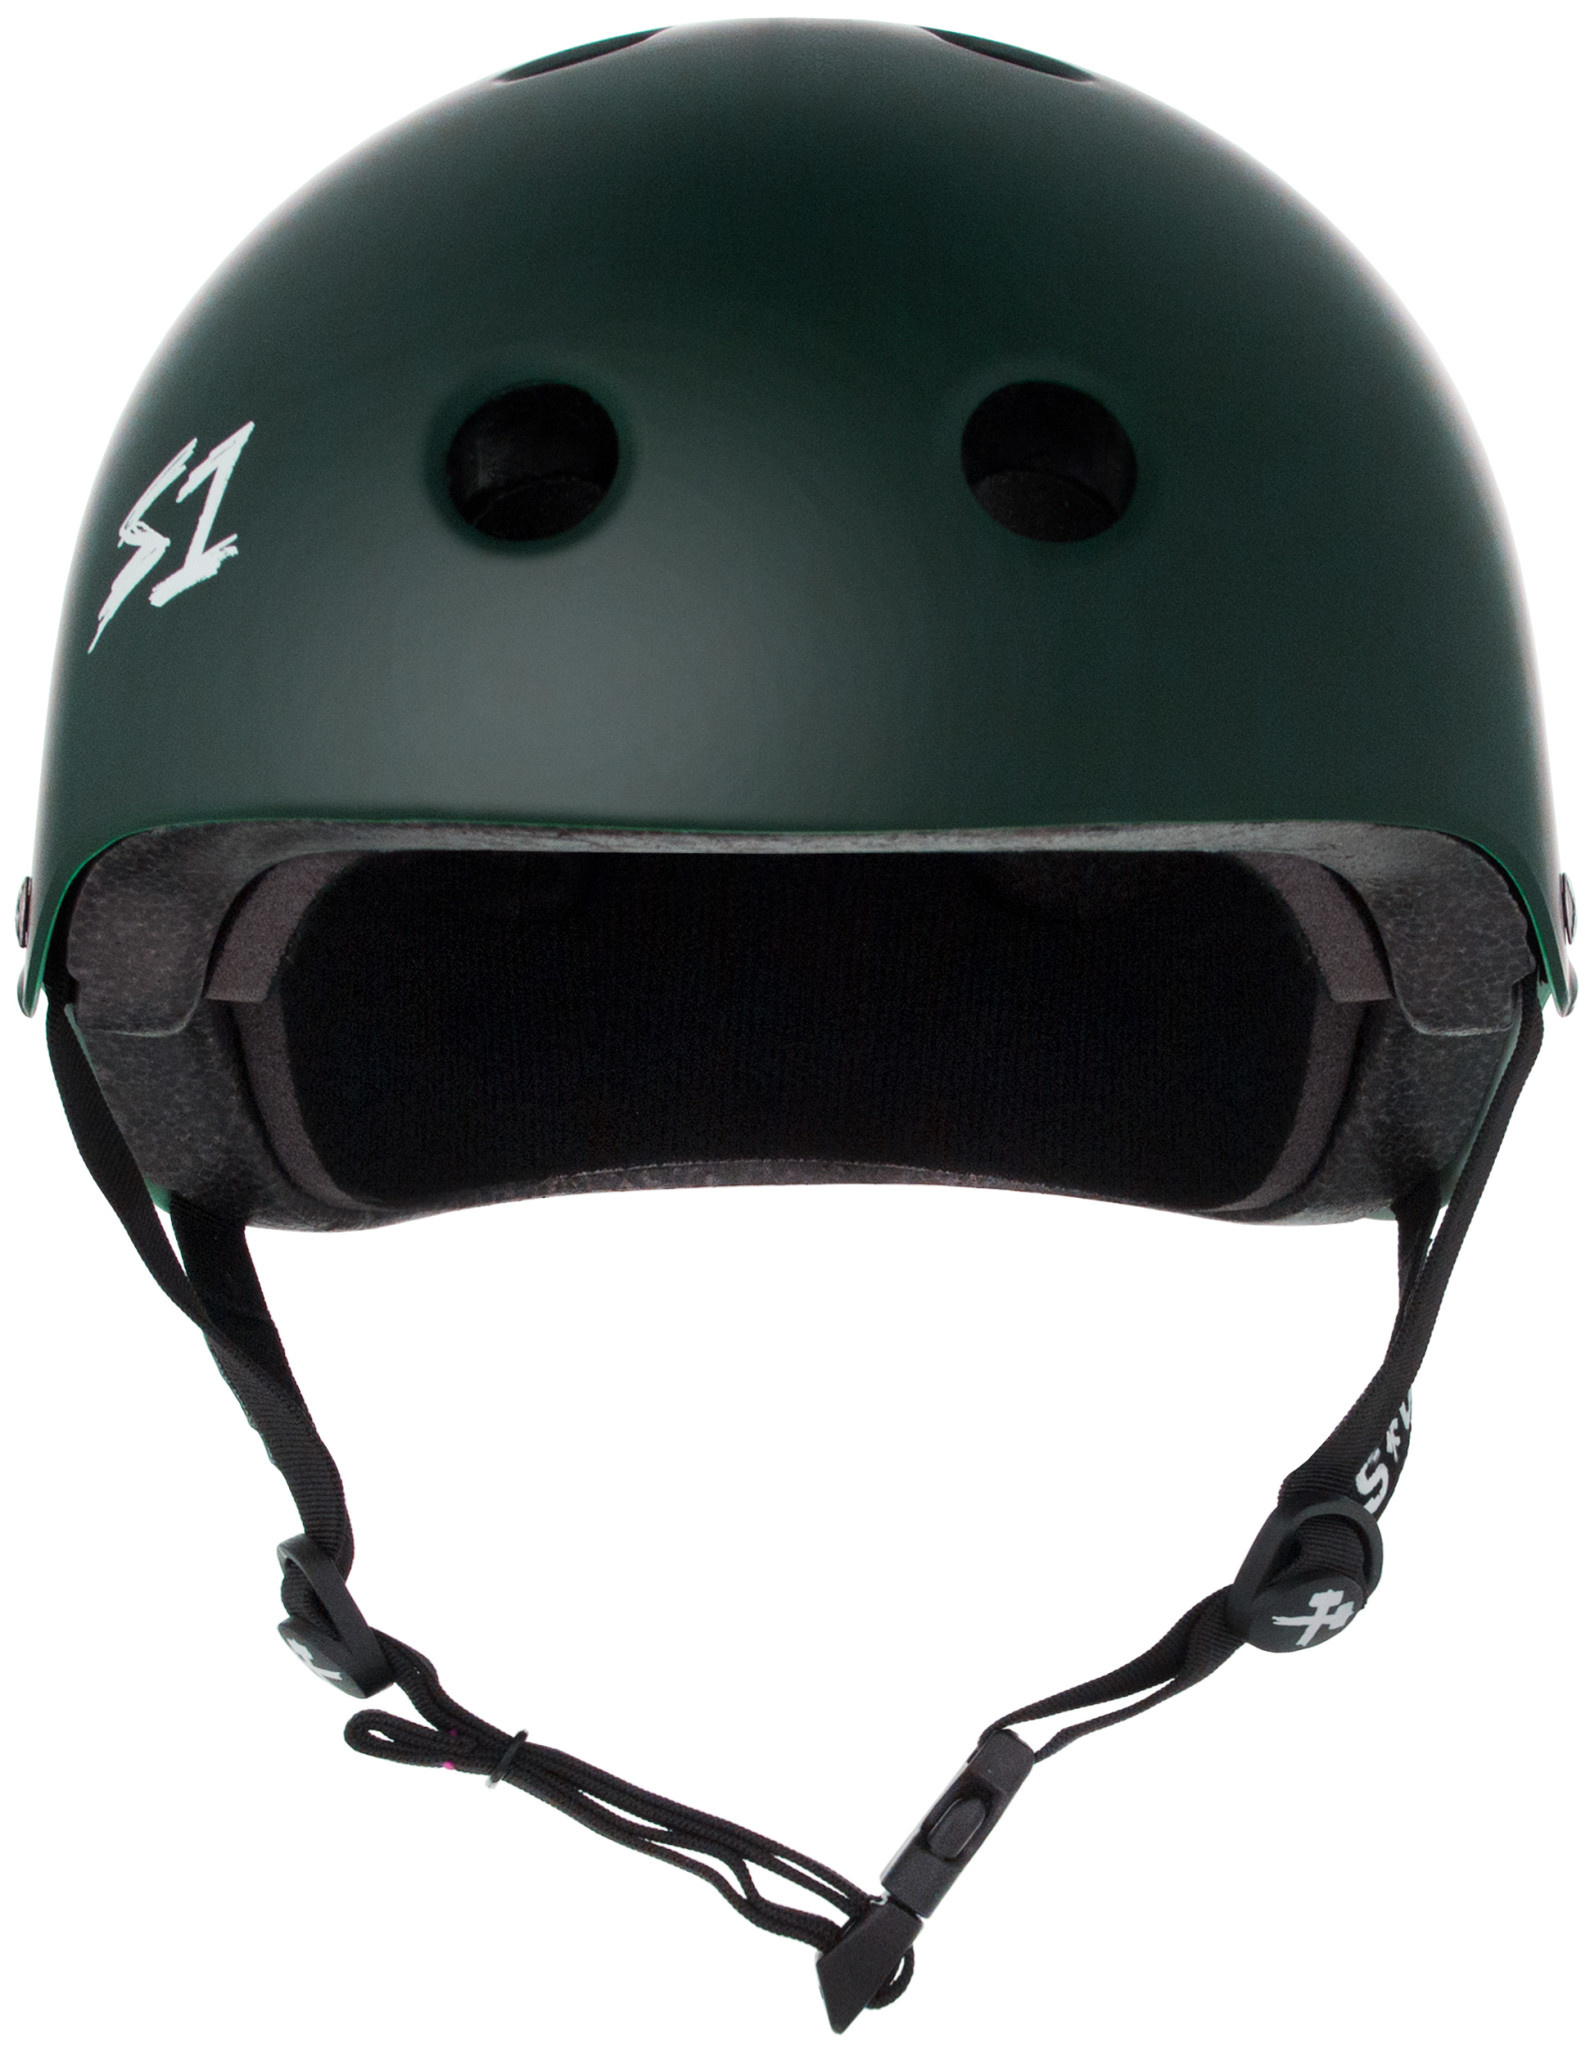 S-1 Lifer Helmet - Dark Green Matte